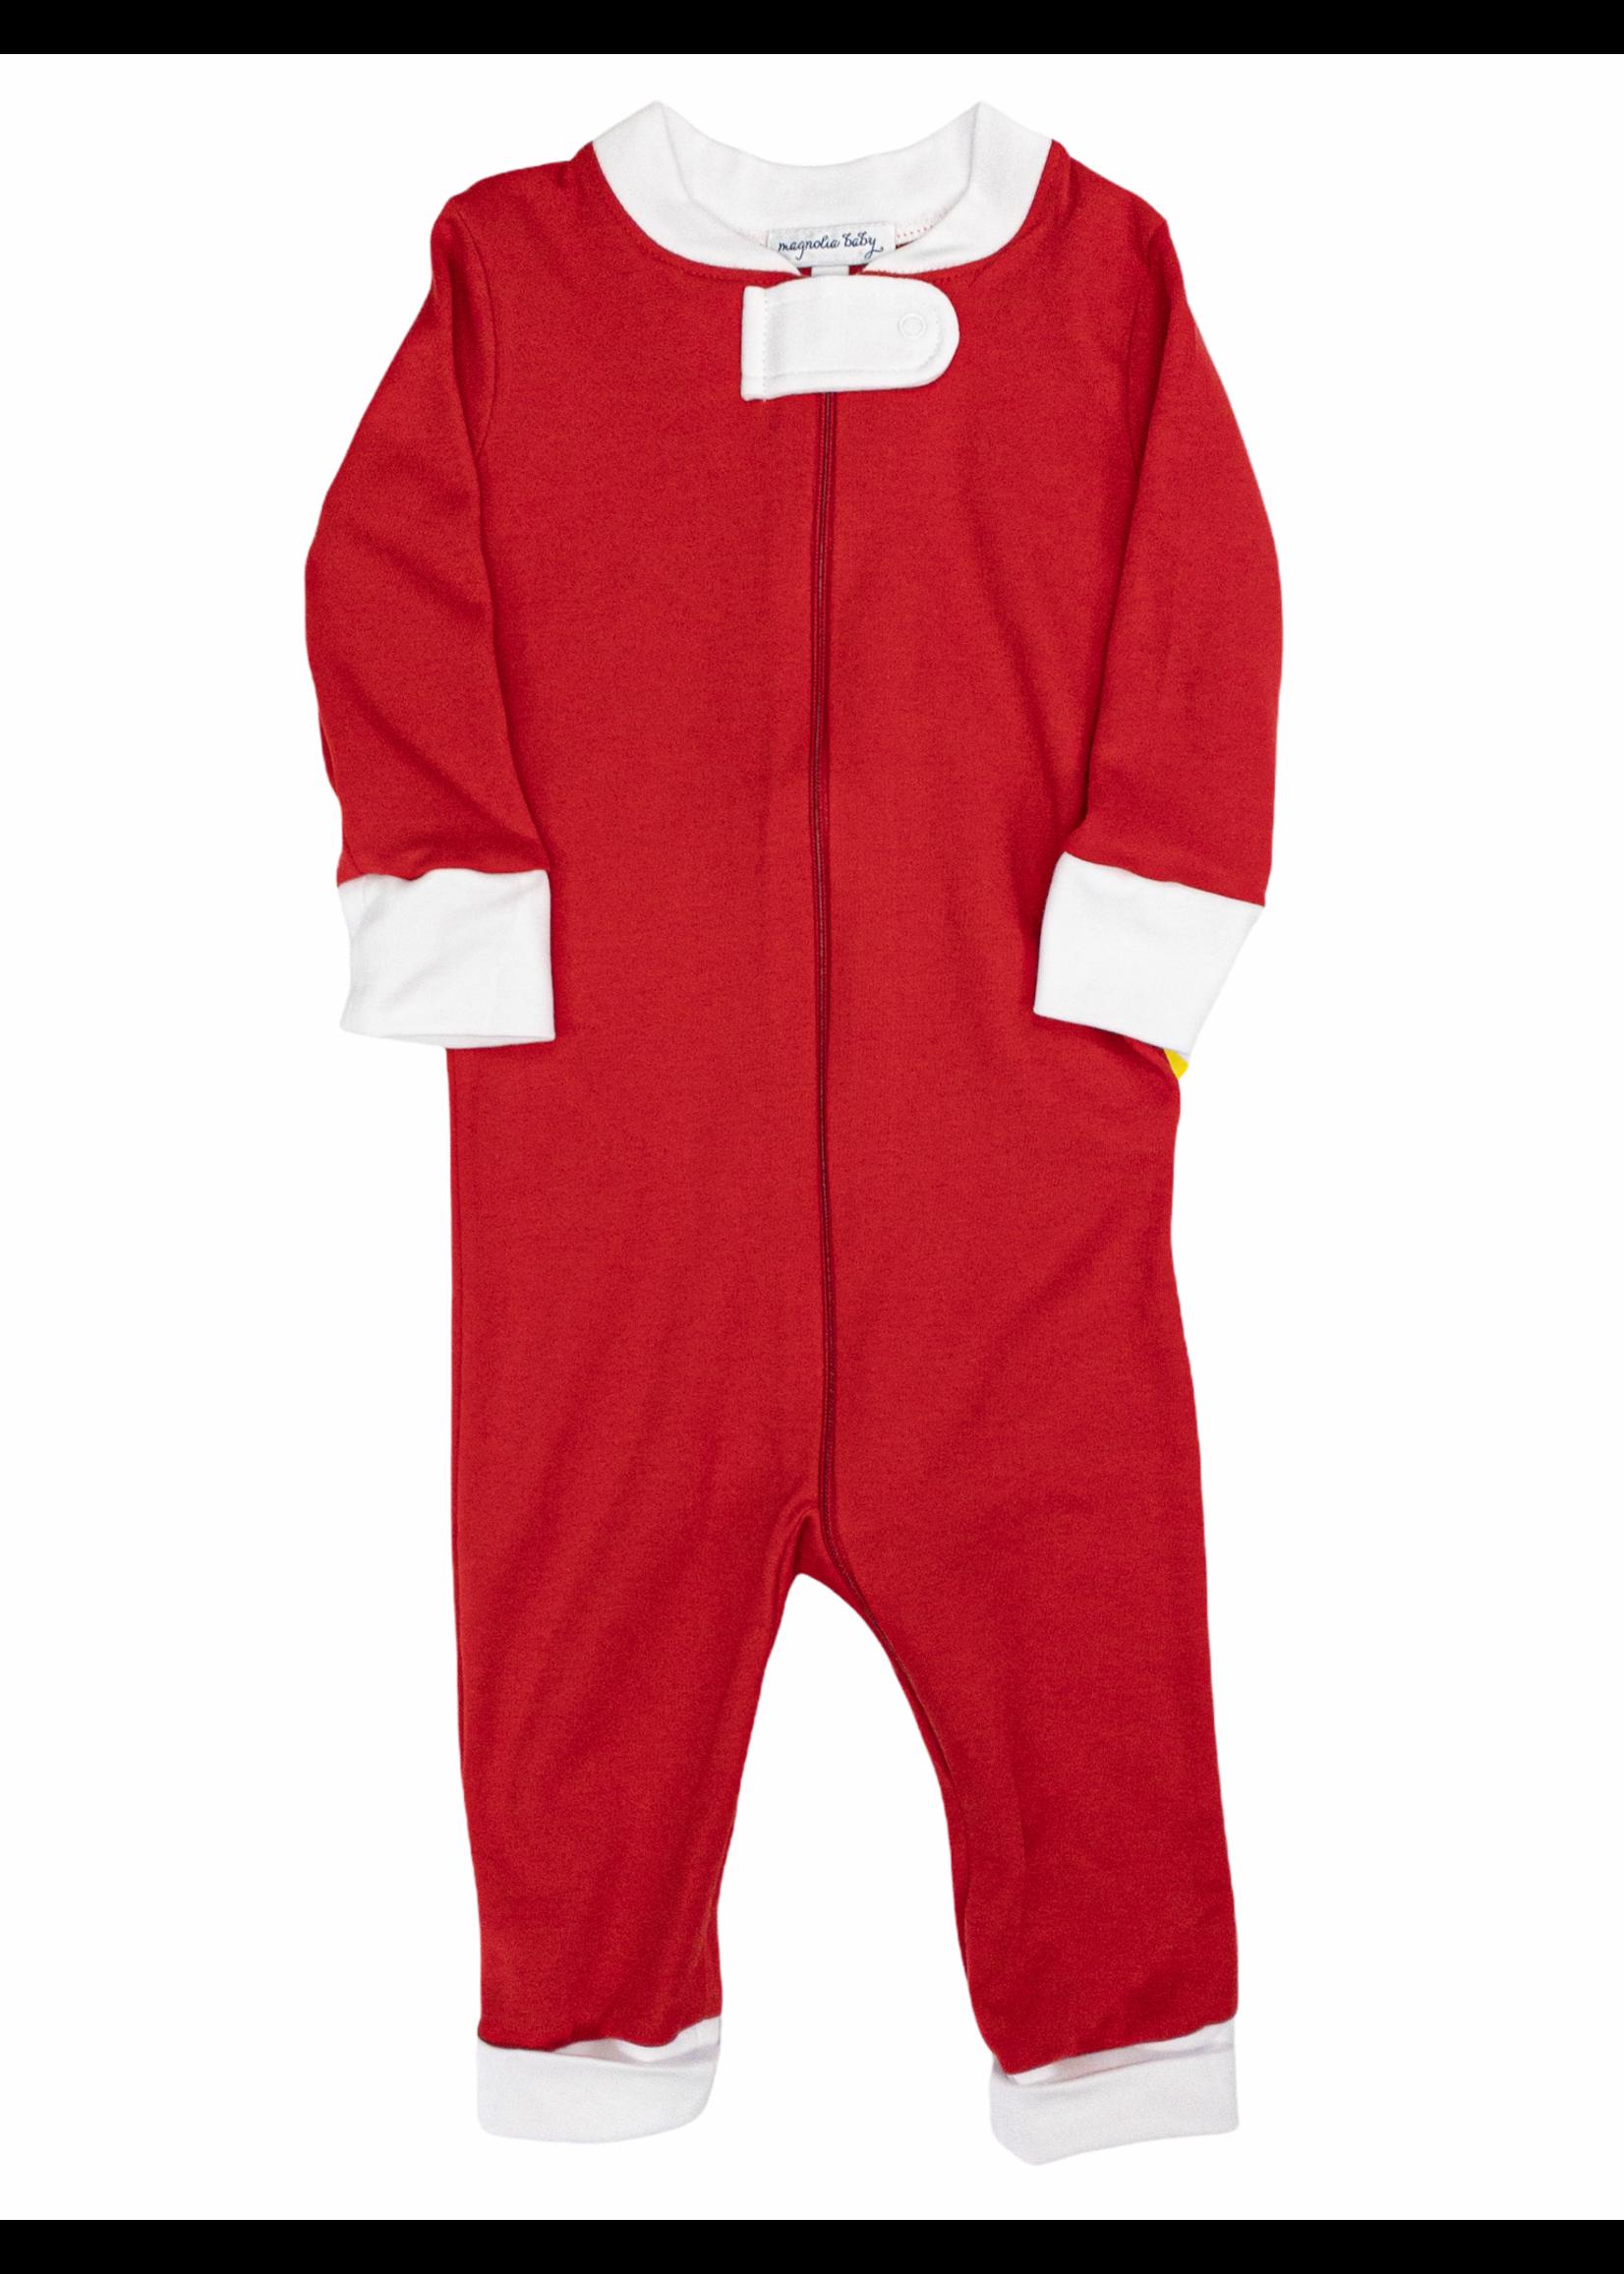 Magnolia Baby Solid Red Basics Zipped Pajama